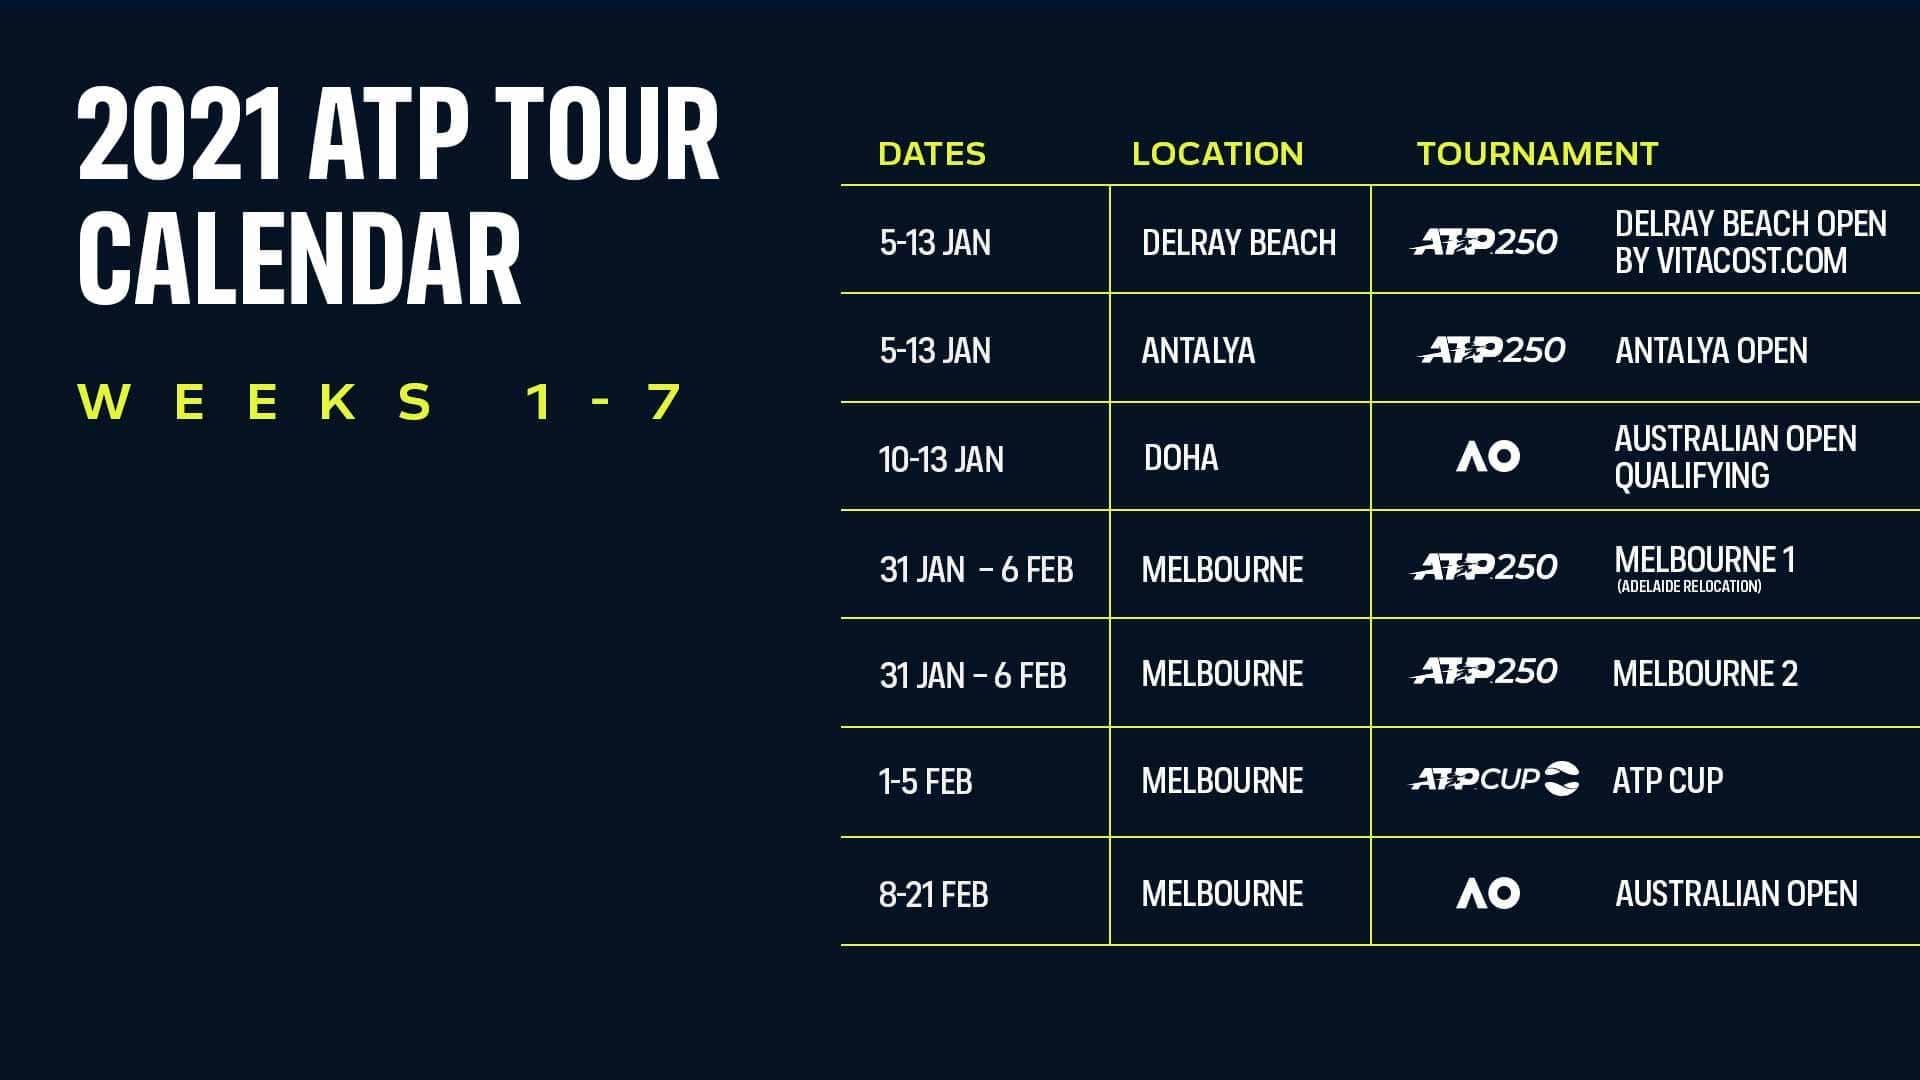 Calendrier Tennis Atp 2022 ATP Announces Updated Start To 2021 Calendar | ATP Tour | Tennis